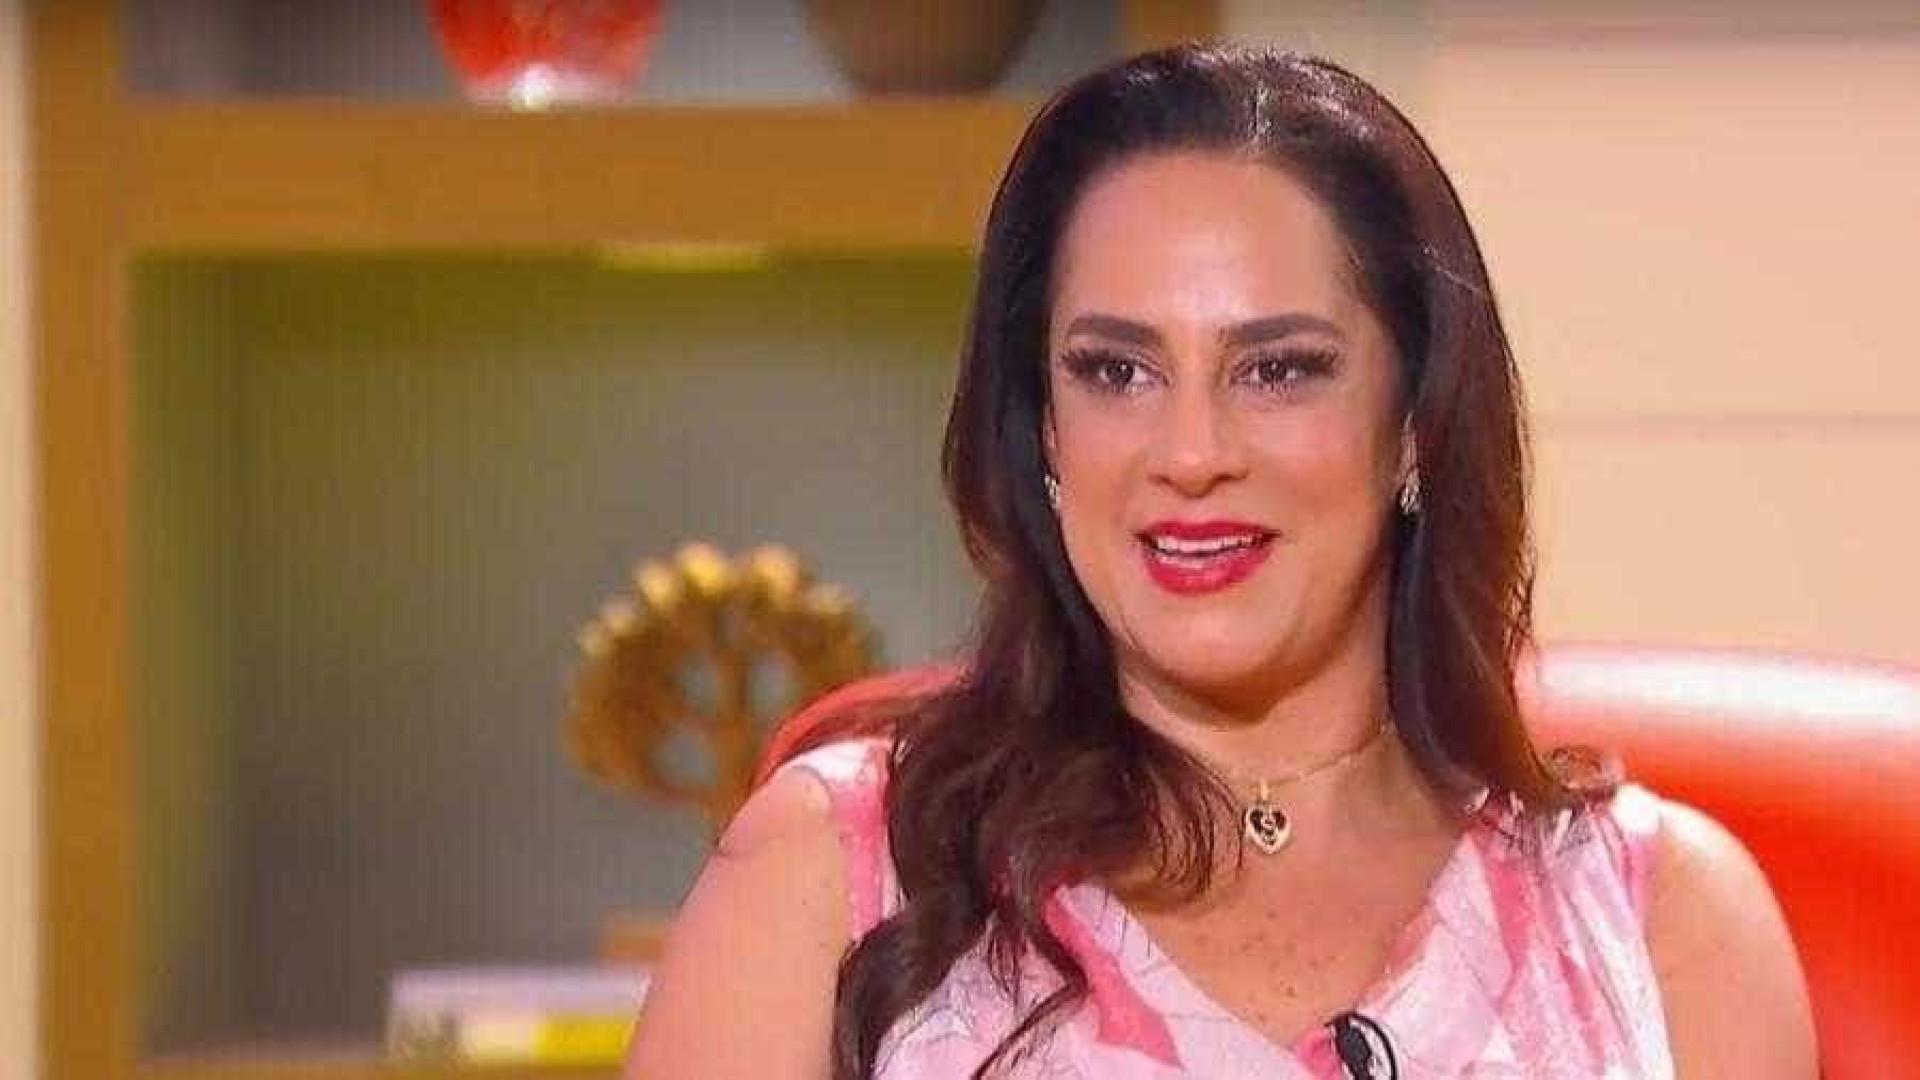 Filha de Silvio Santos, Silvia Abravanel diz como soube que era adotada